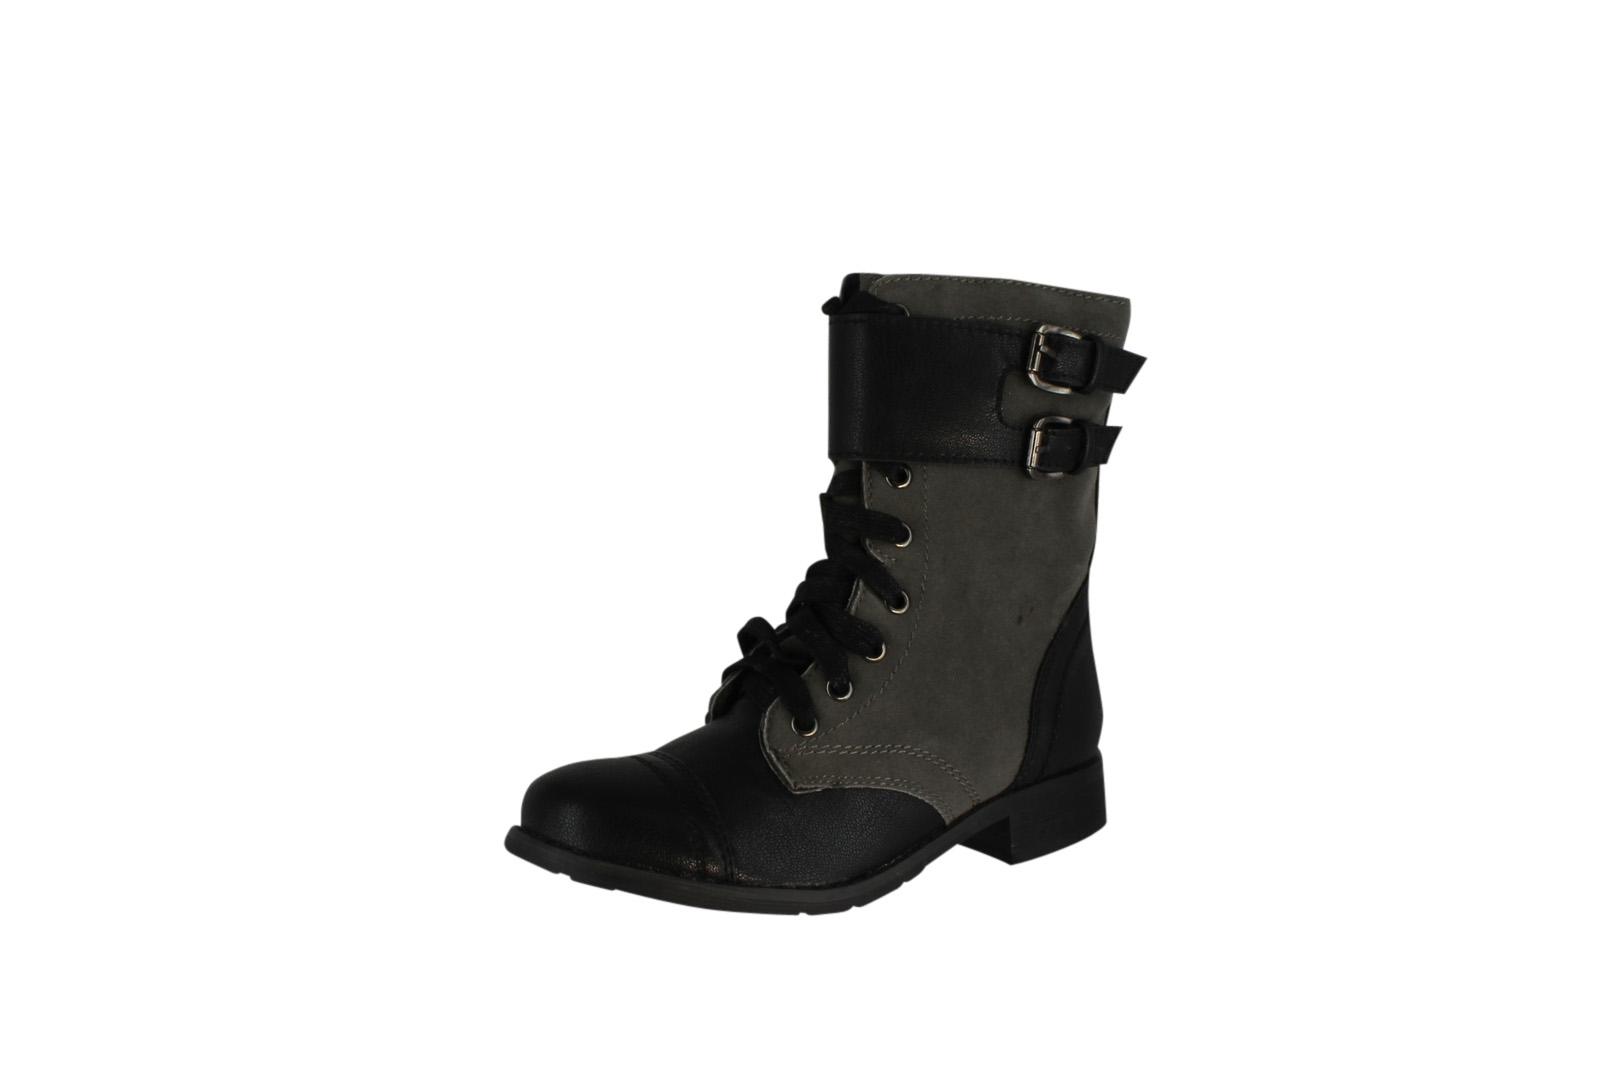 Shoes Women's Tuscon Bootie